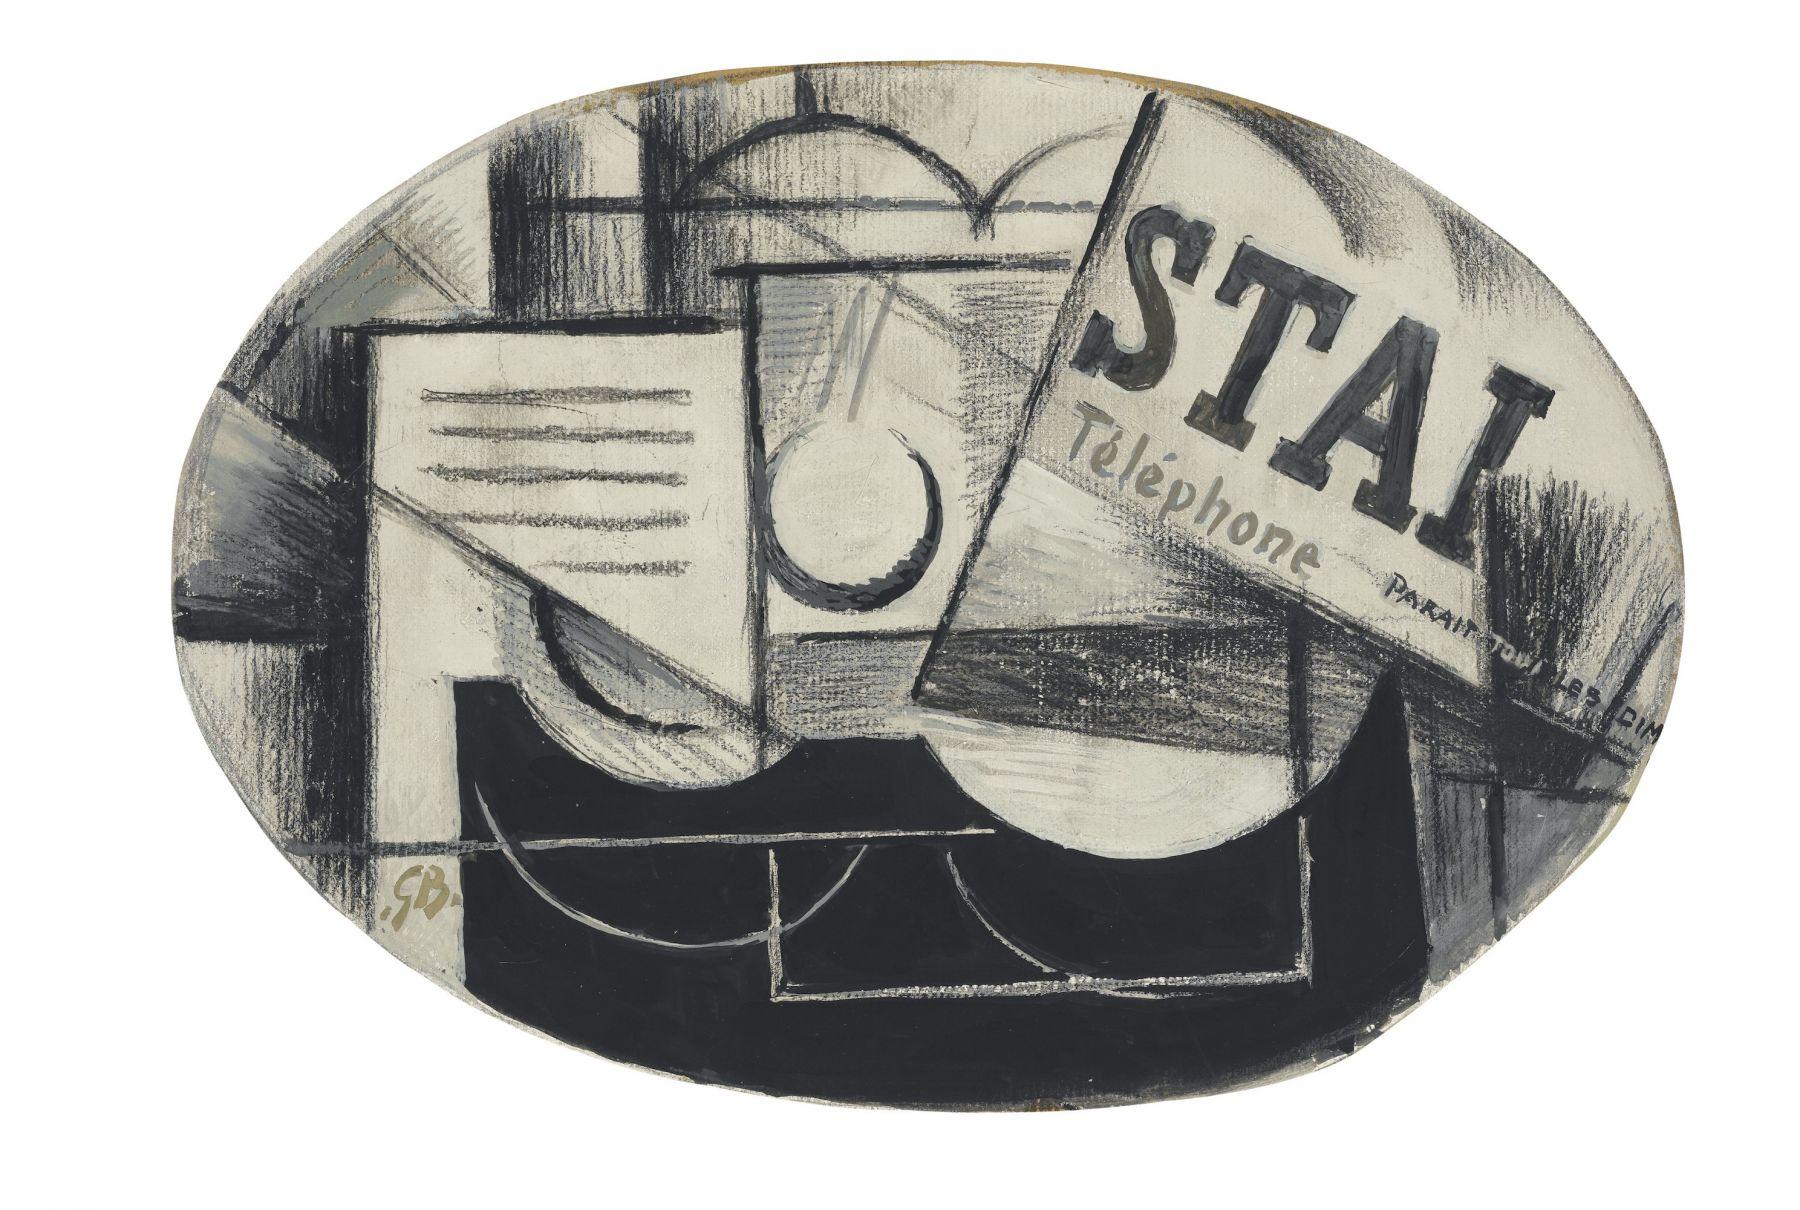 Georges Braque, Guitare et journal: STAL (recto); Femme à la mandoline (verso), 1913 gouache, charcoal and pencil on board 28 x 42 cm. (11 x 16 1/2 in.)